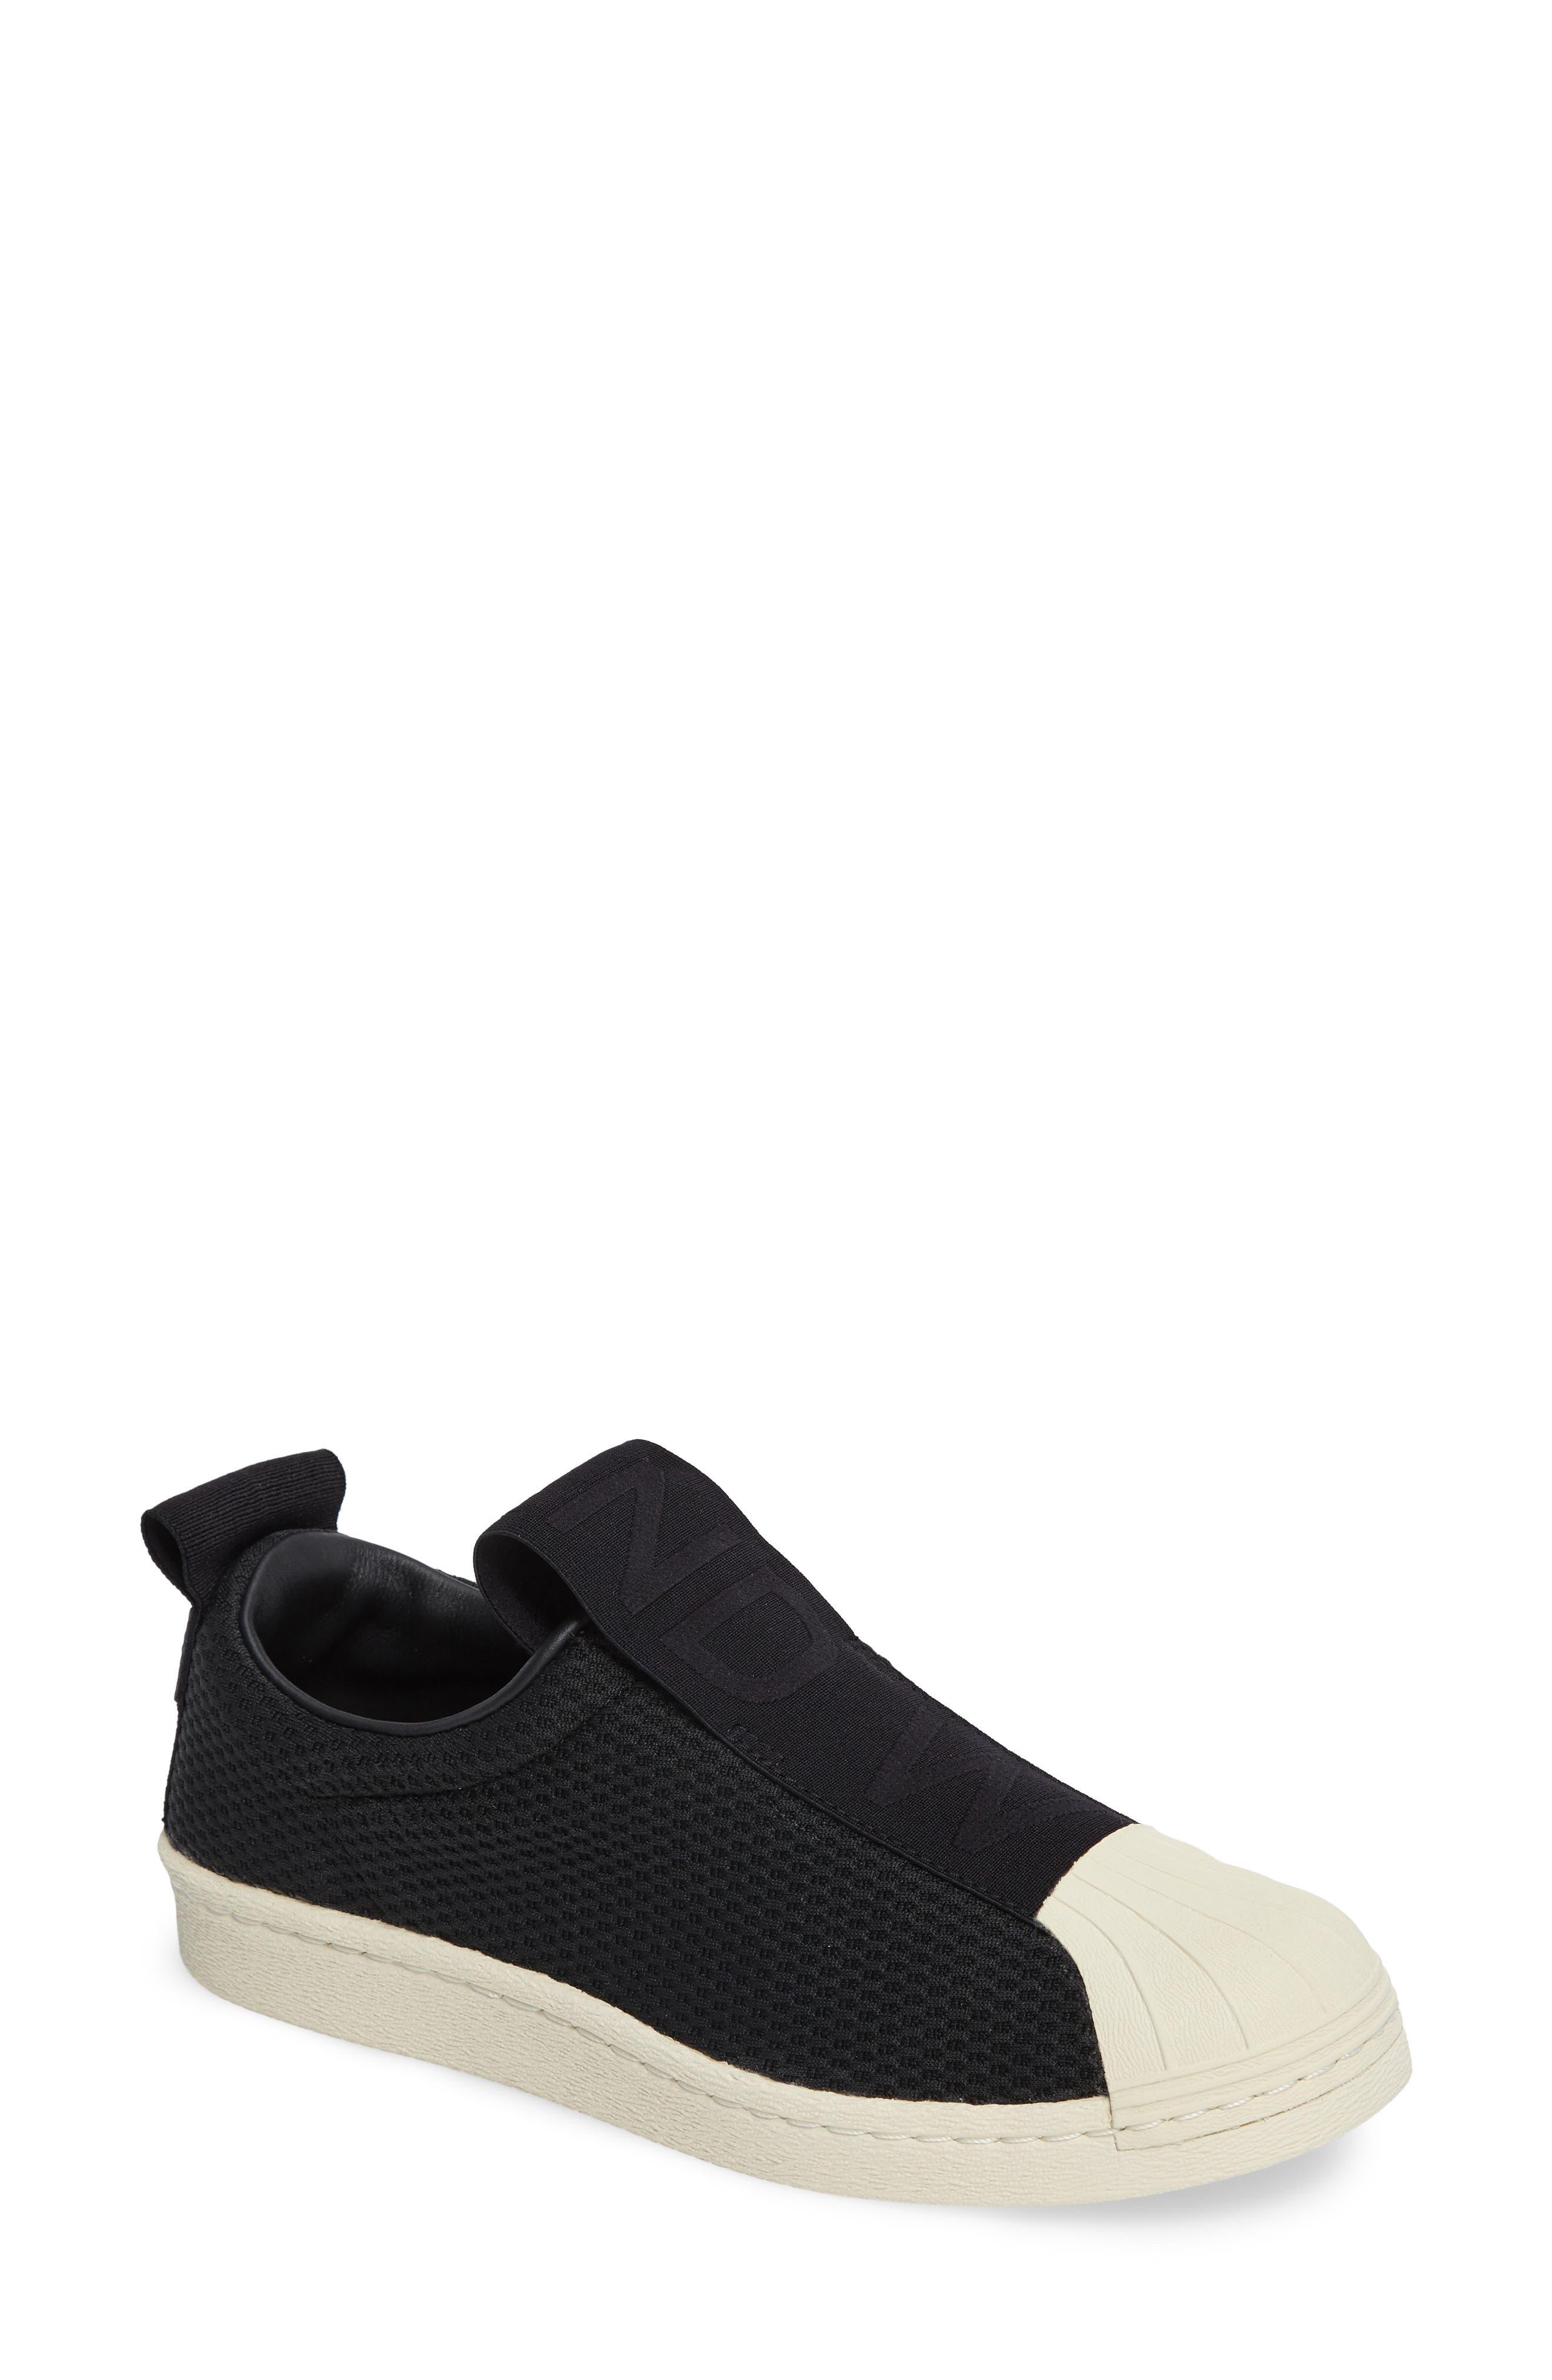 adidas Superstar Slip-On Sneaker (Women)